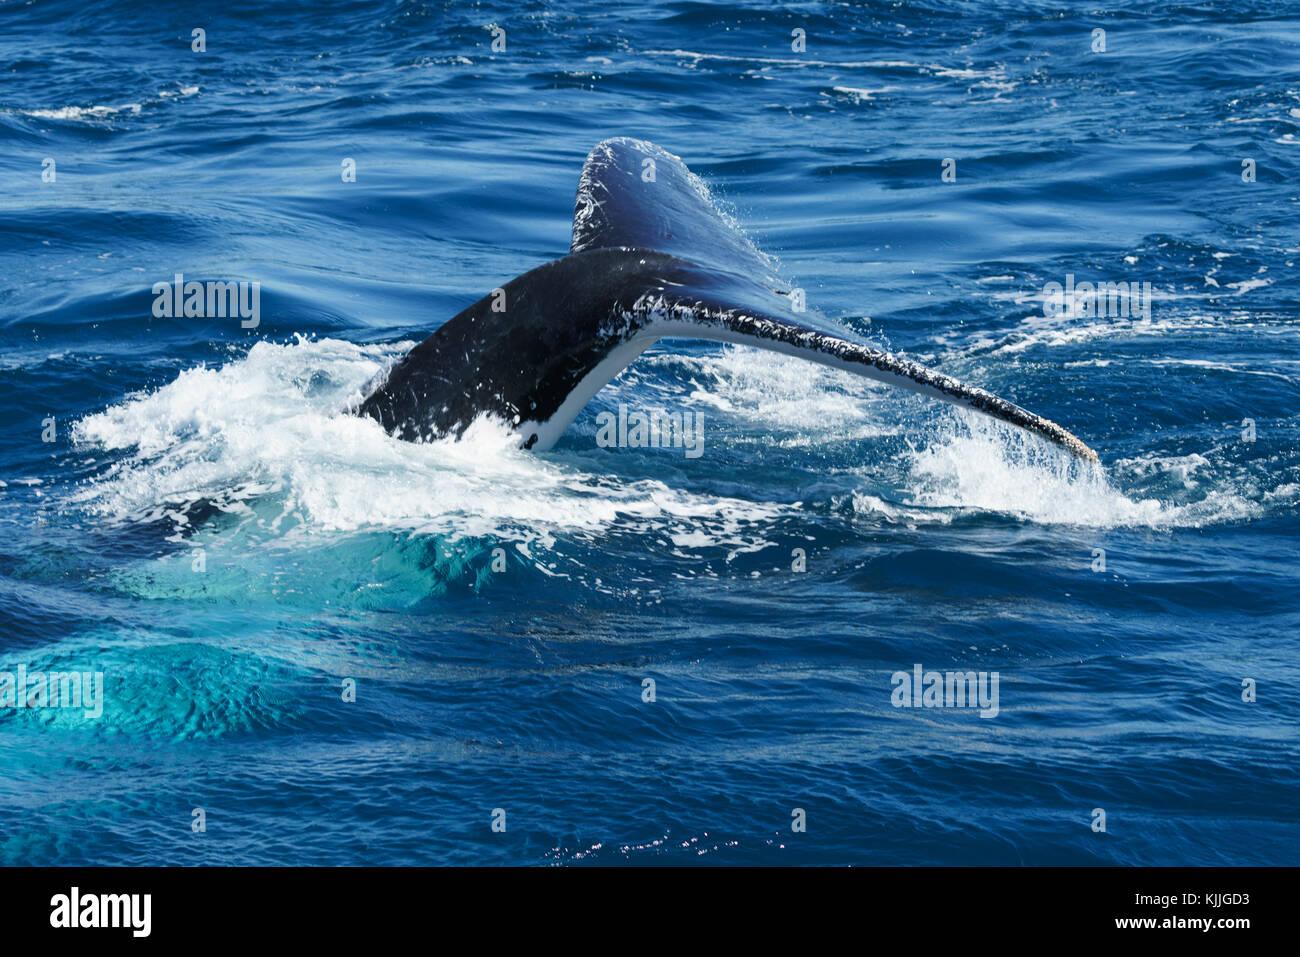 Whales, Brisbane, Australia, Lifestyle Travel, Blue sky, ocean, close-up - Stock Image